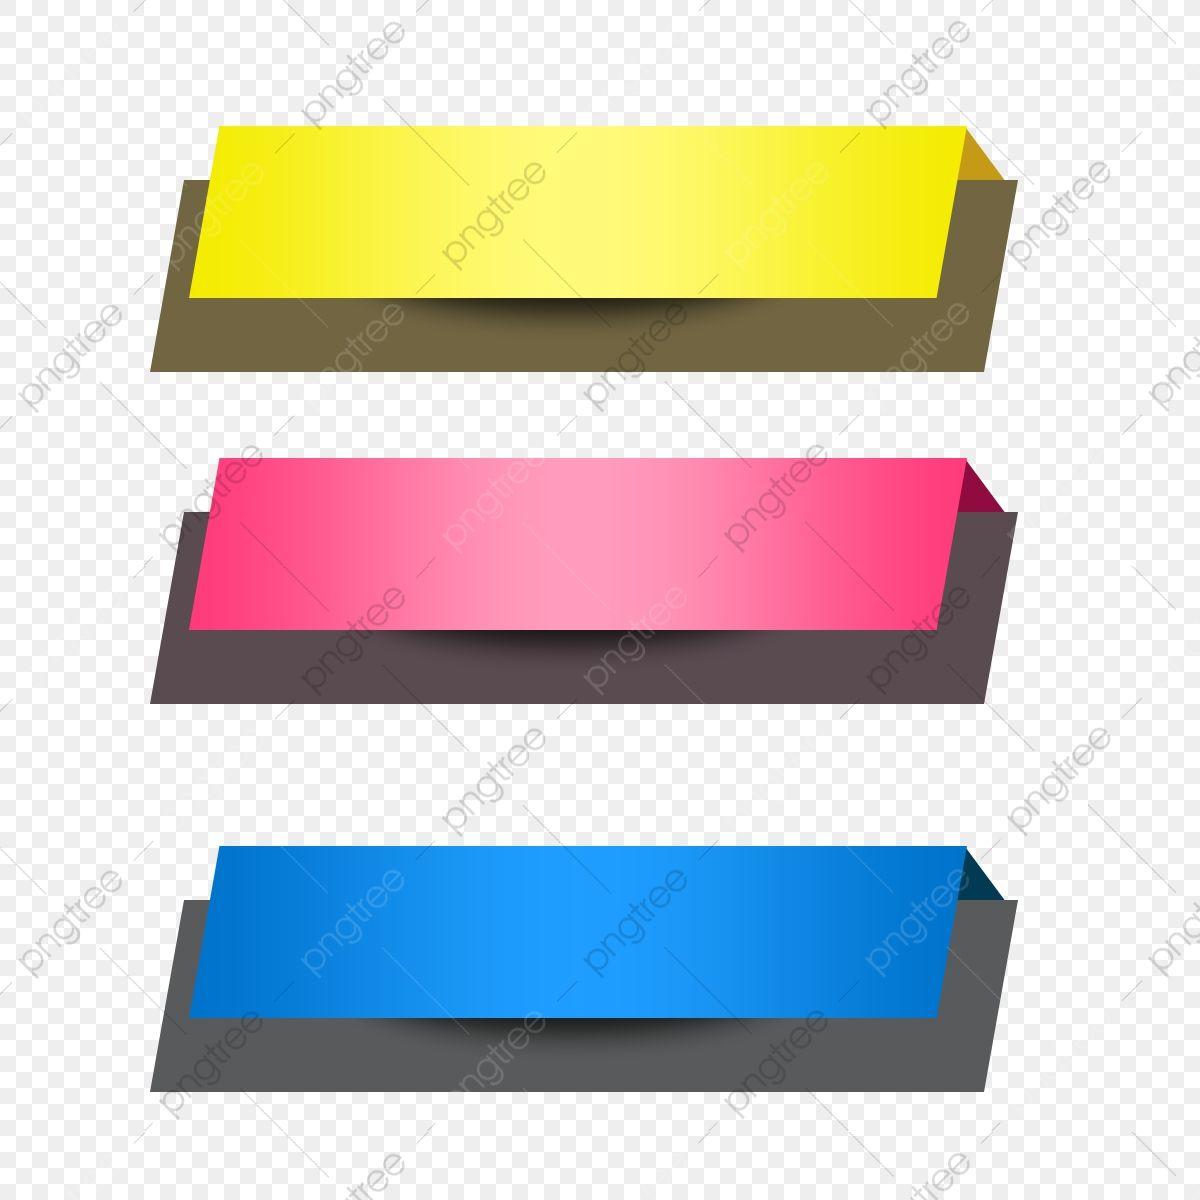 Ribbon Black And White Banner Png Angle Artwork Automotive Design Awareness Ribbon Banner Banner Design Ribbon Png Vintage Ribbon Banner